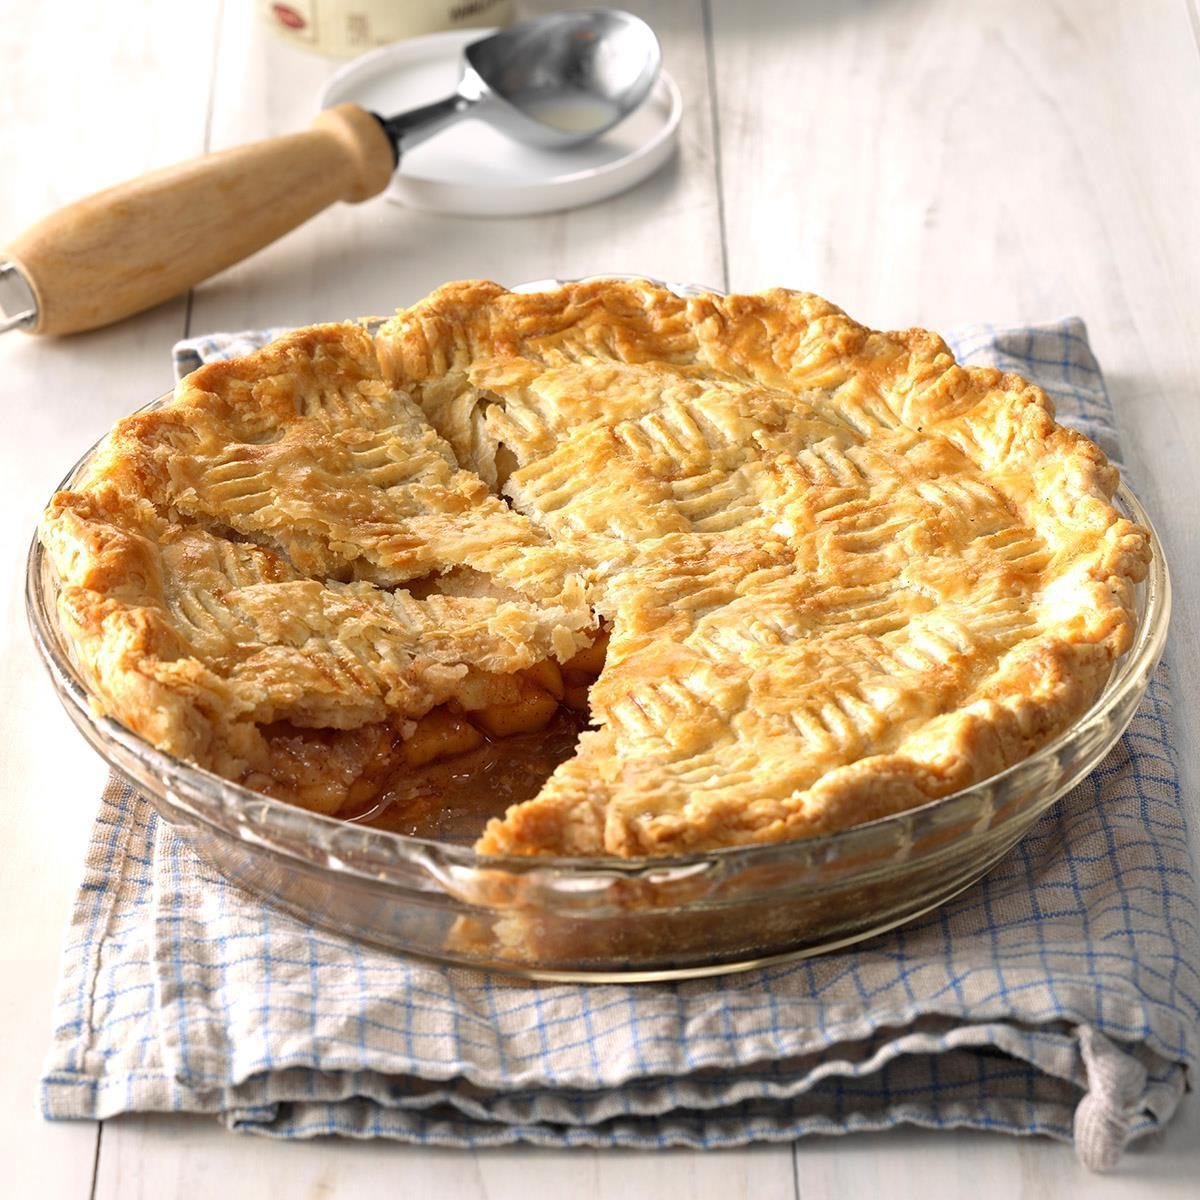 West Virginia: Golden Delicious Apple Pie